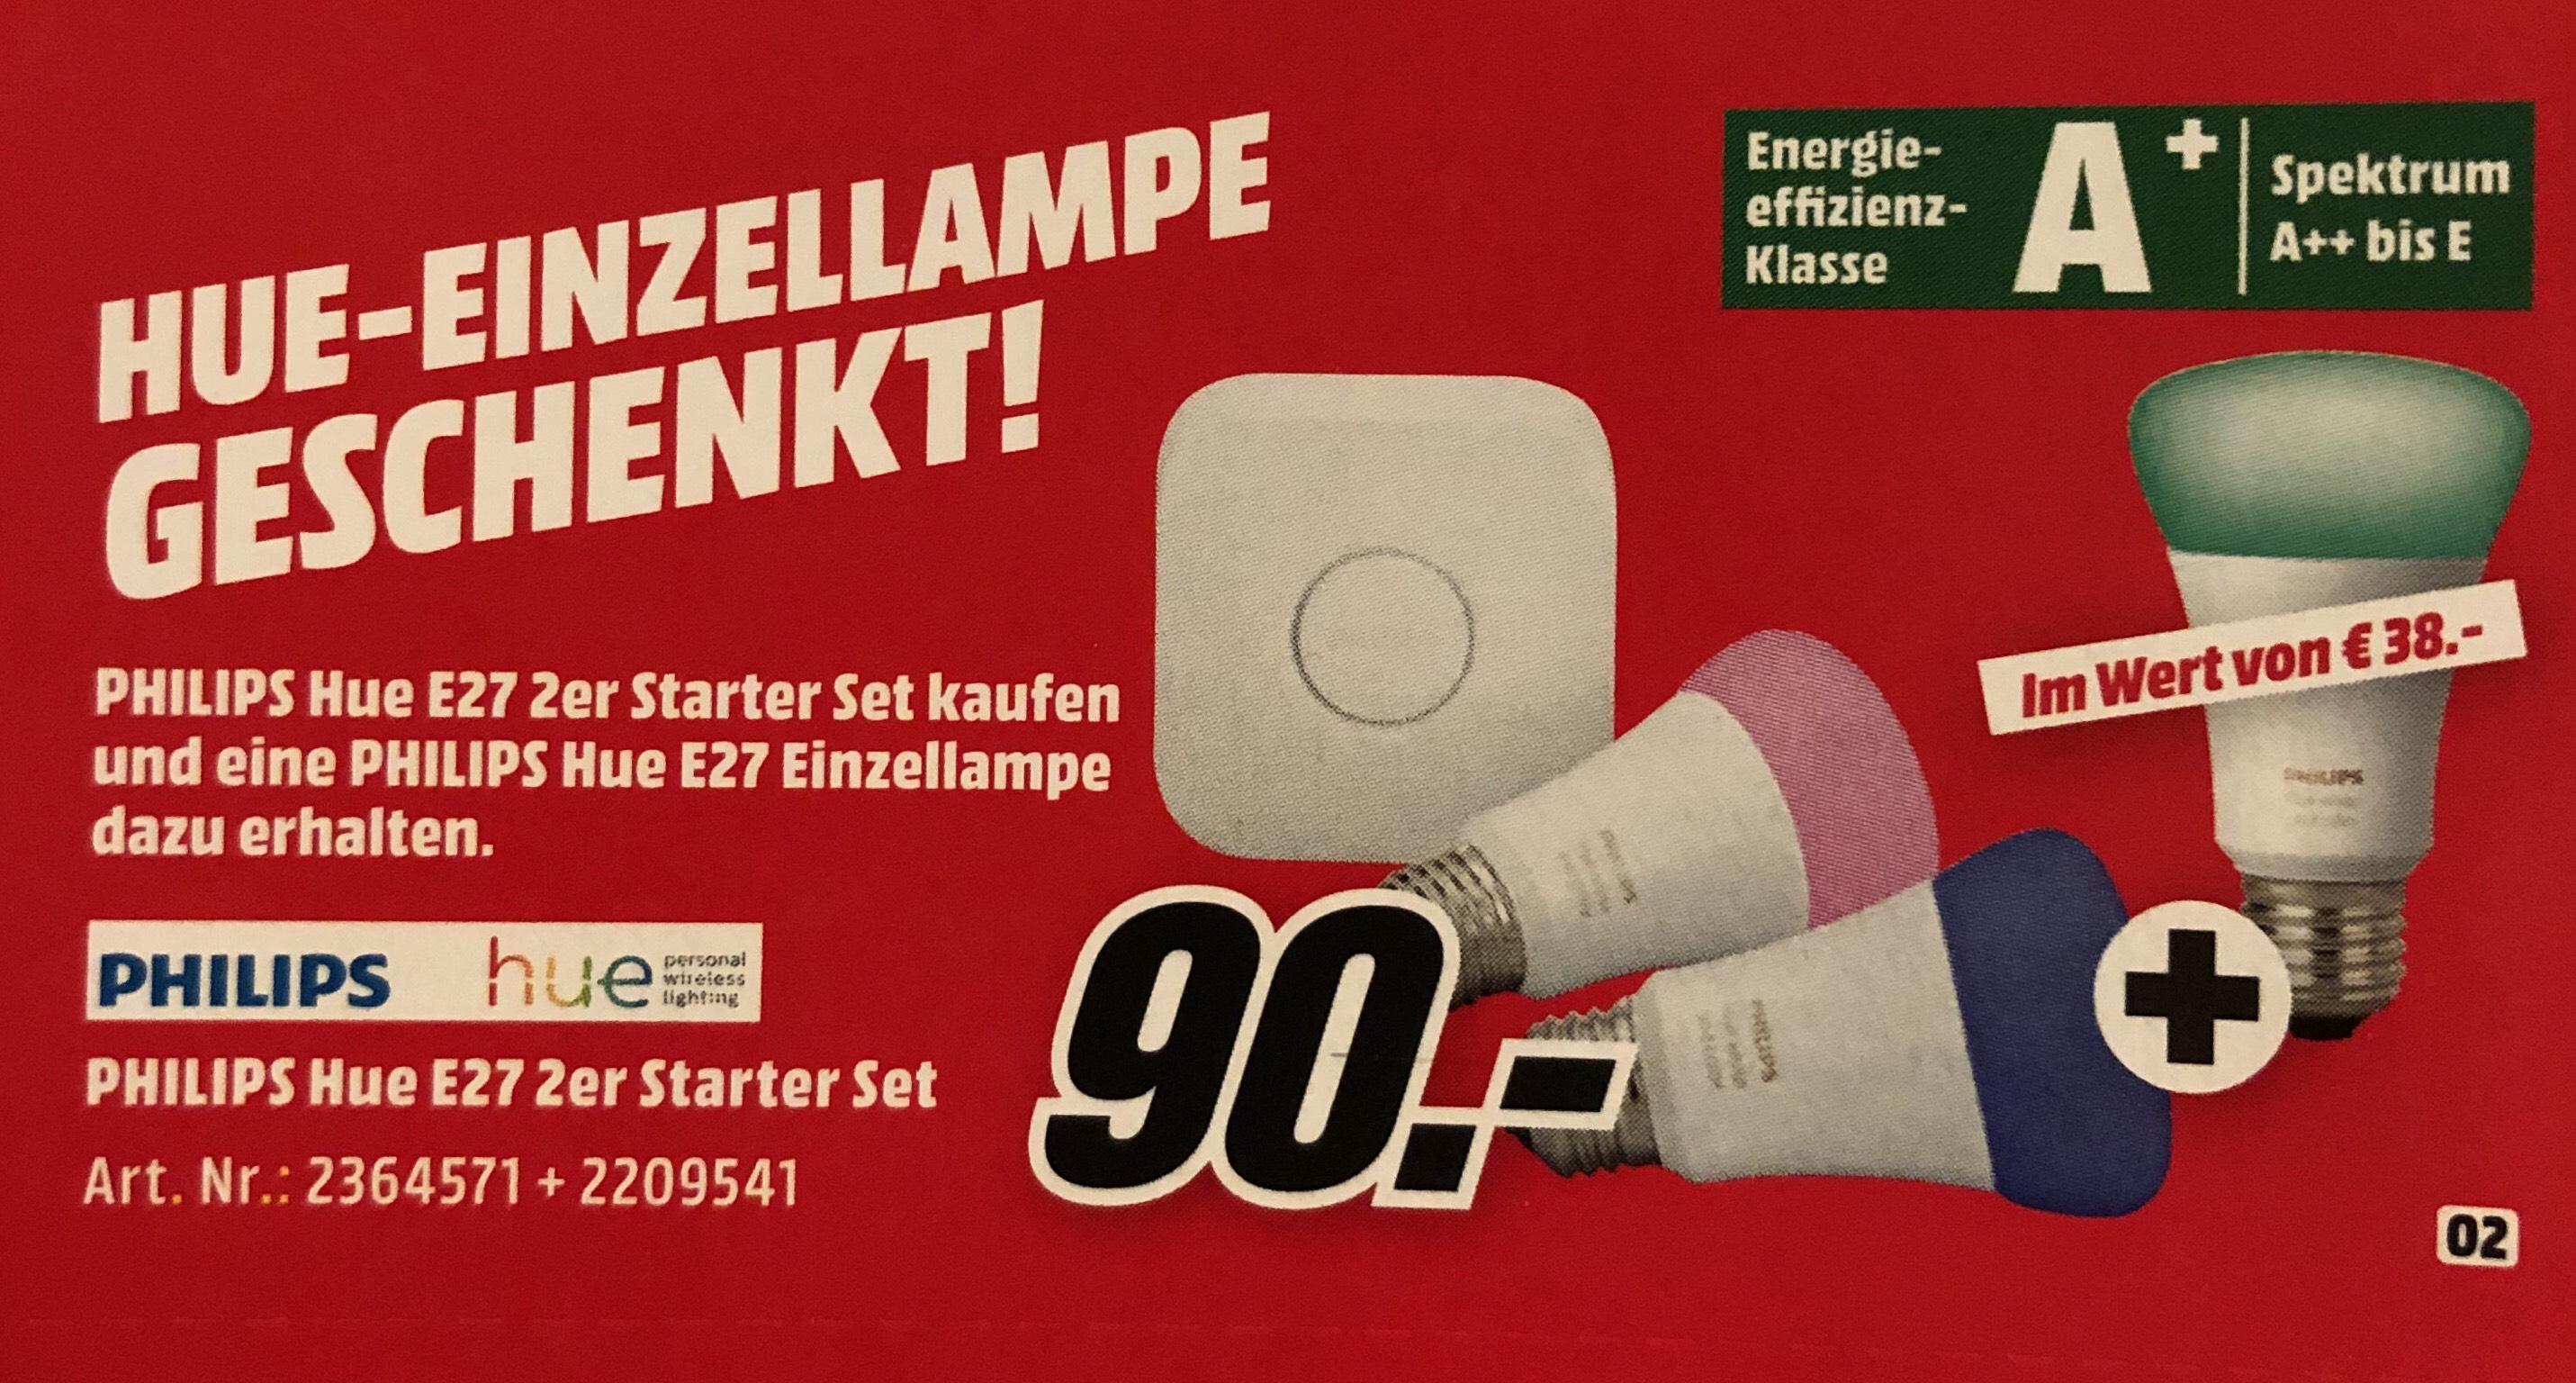 Philips Hue E27 2er Starterset + Philips Hue E27 Einzellampe